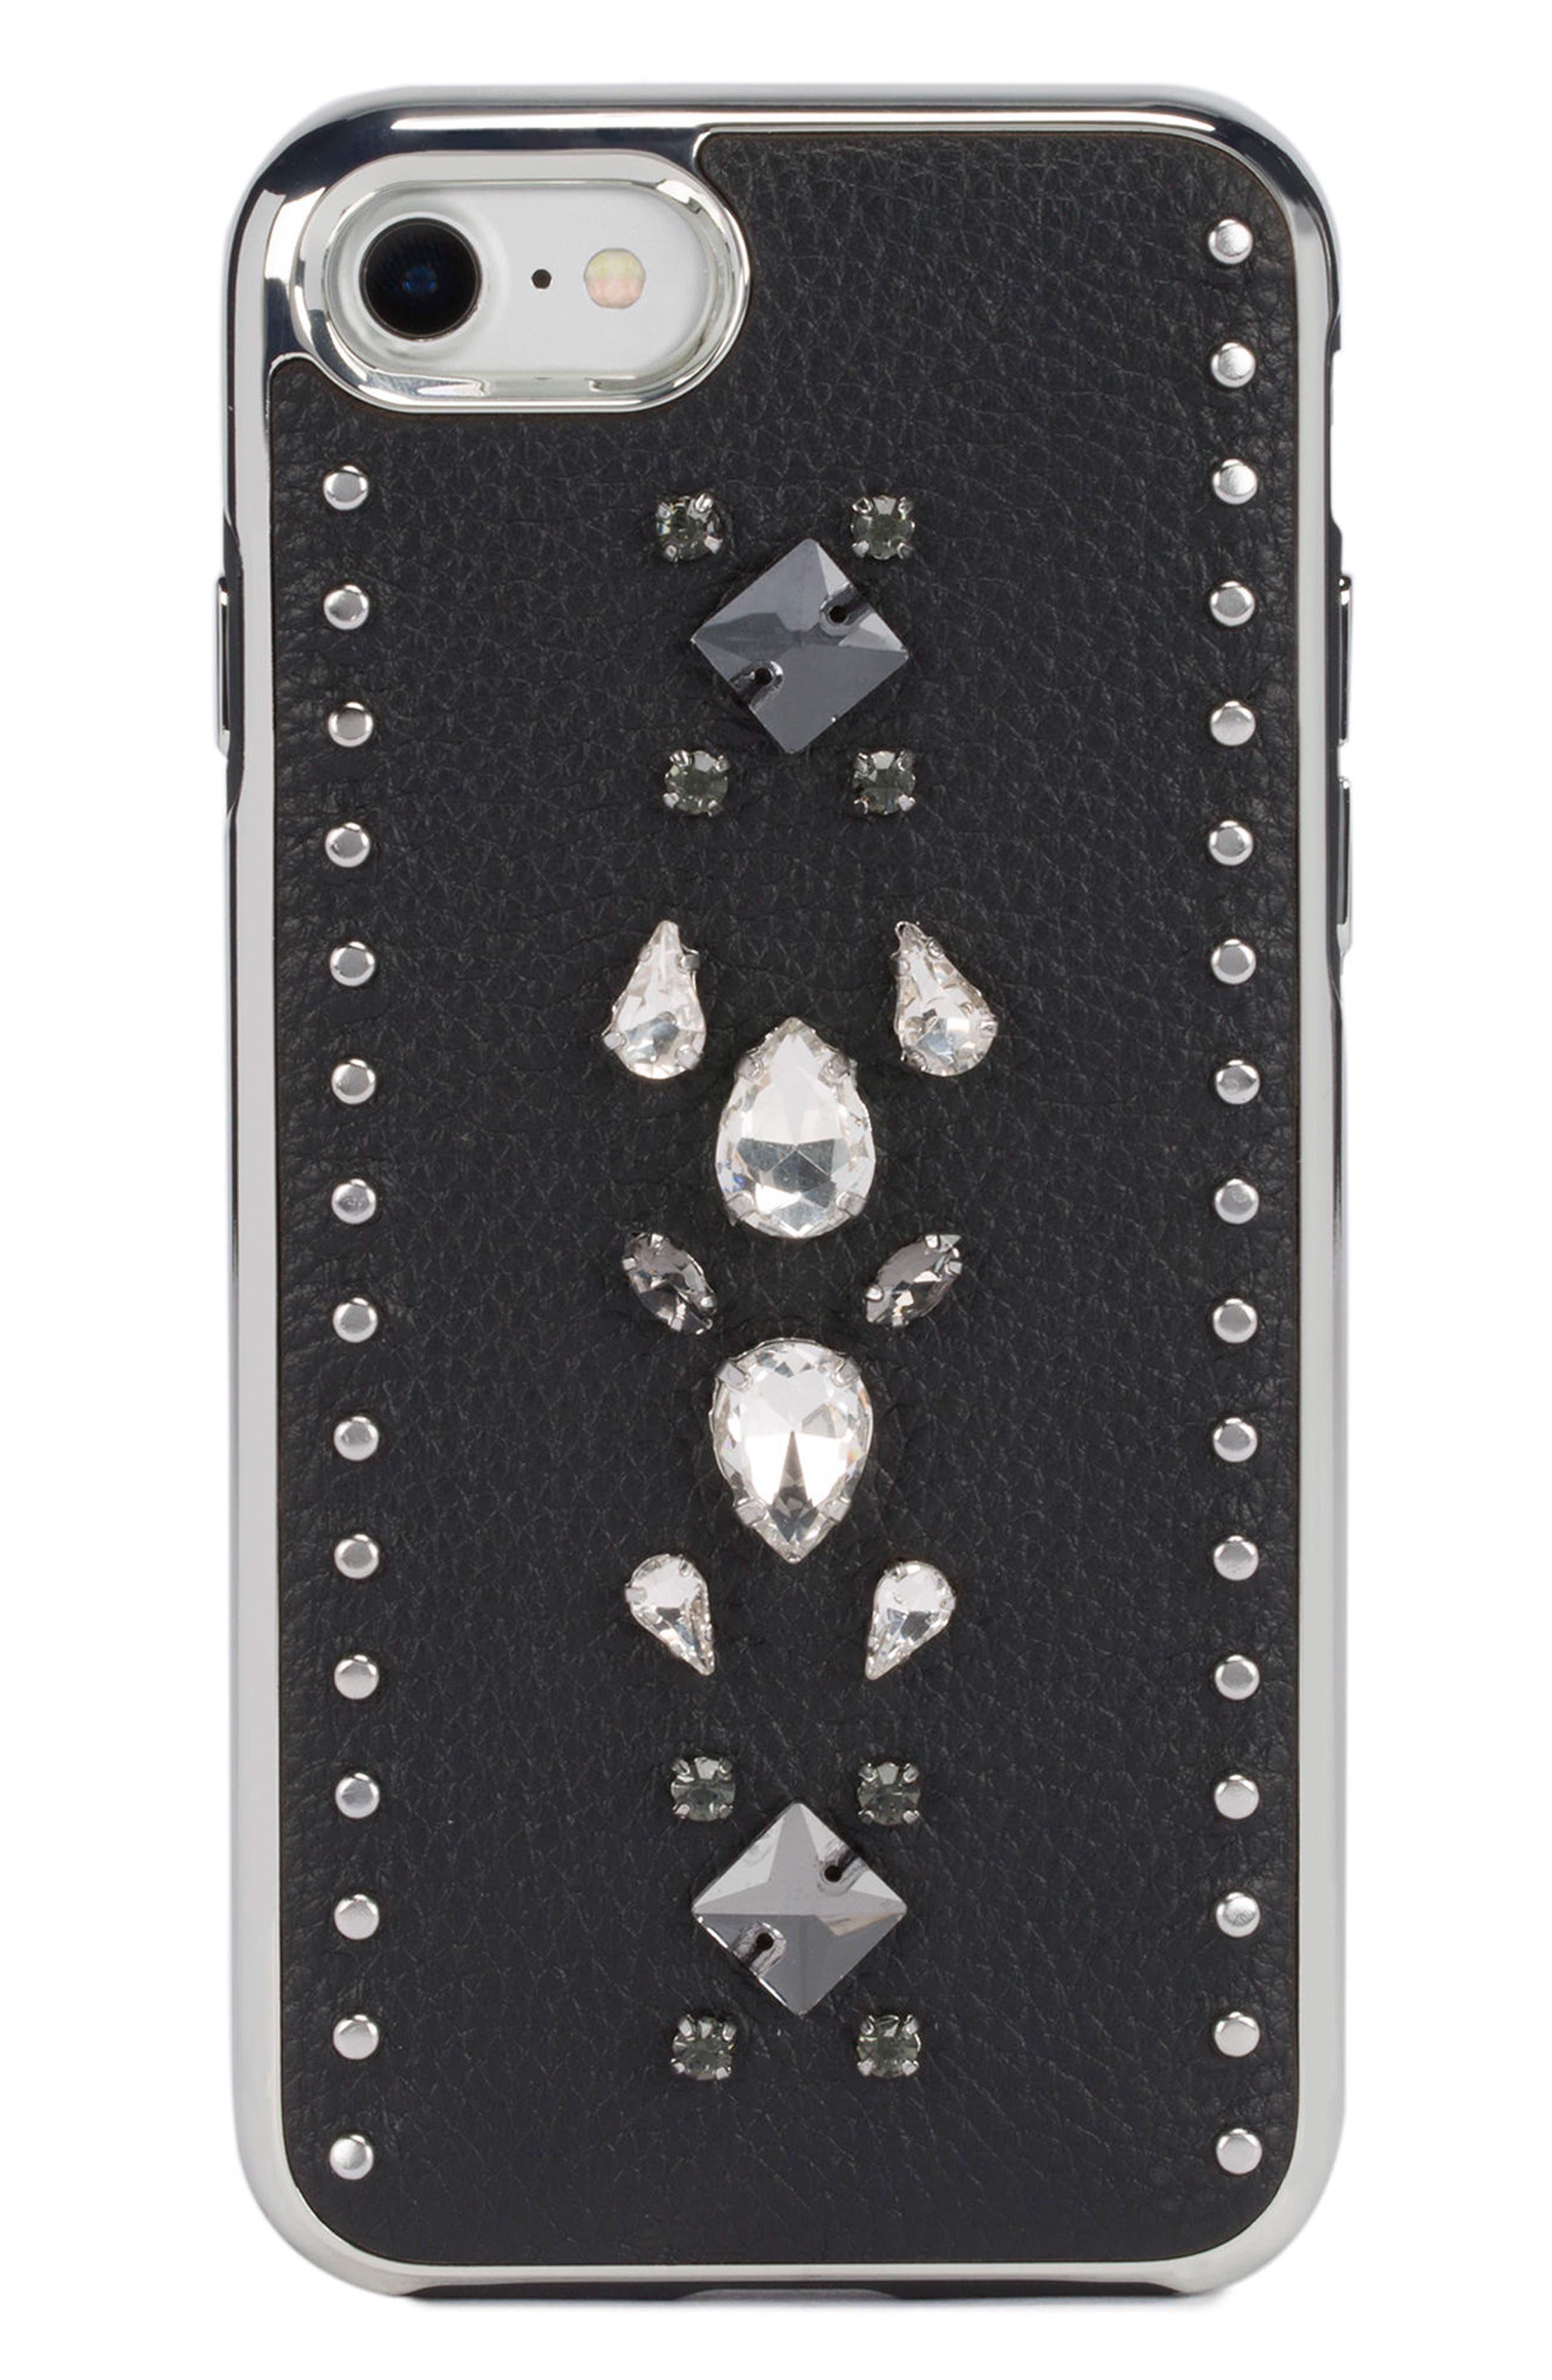 Inlay Gem Leather iPhone 7/8 Plus Case,                             Main thumbnail 1, color,                             Multi Gems/ Studs/ Black